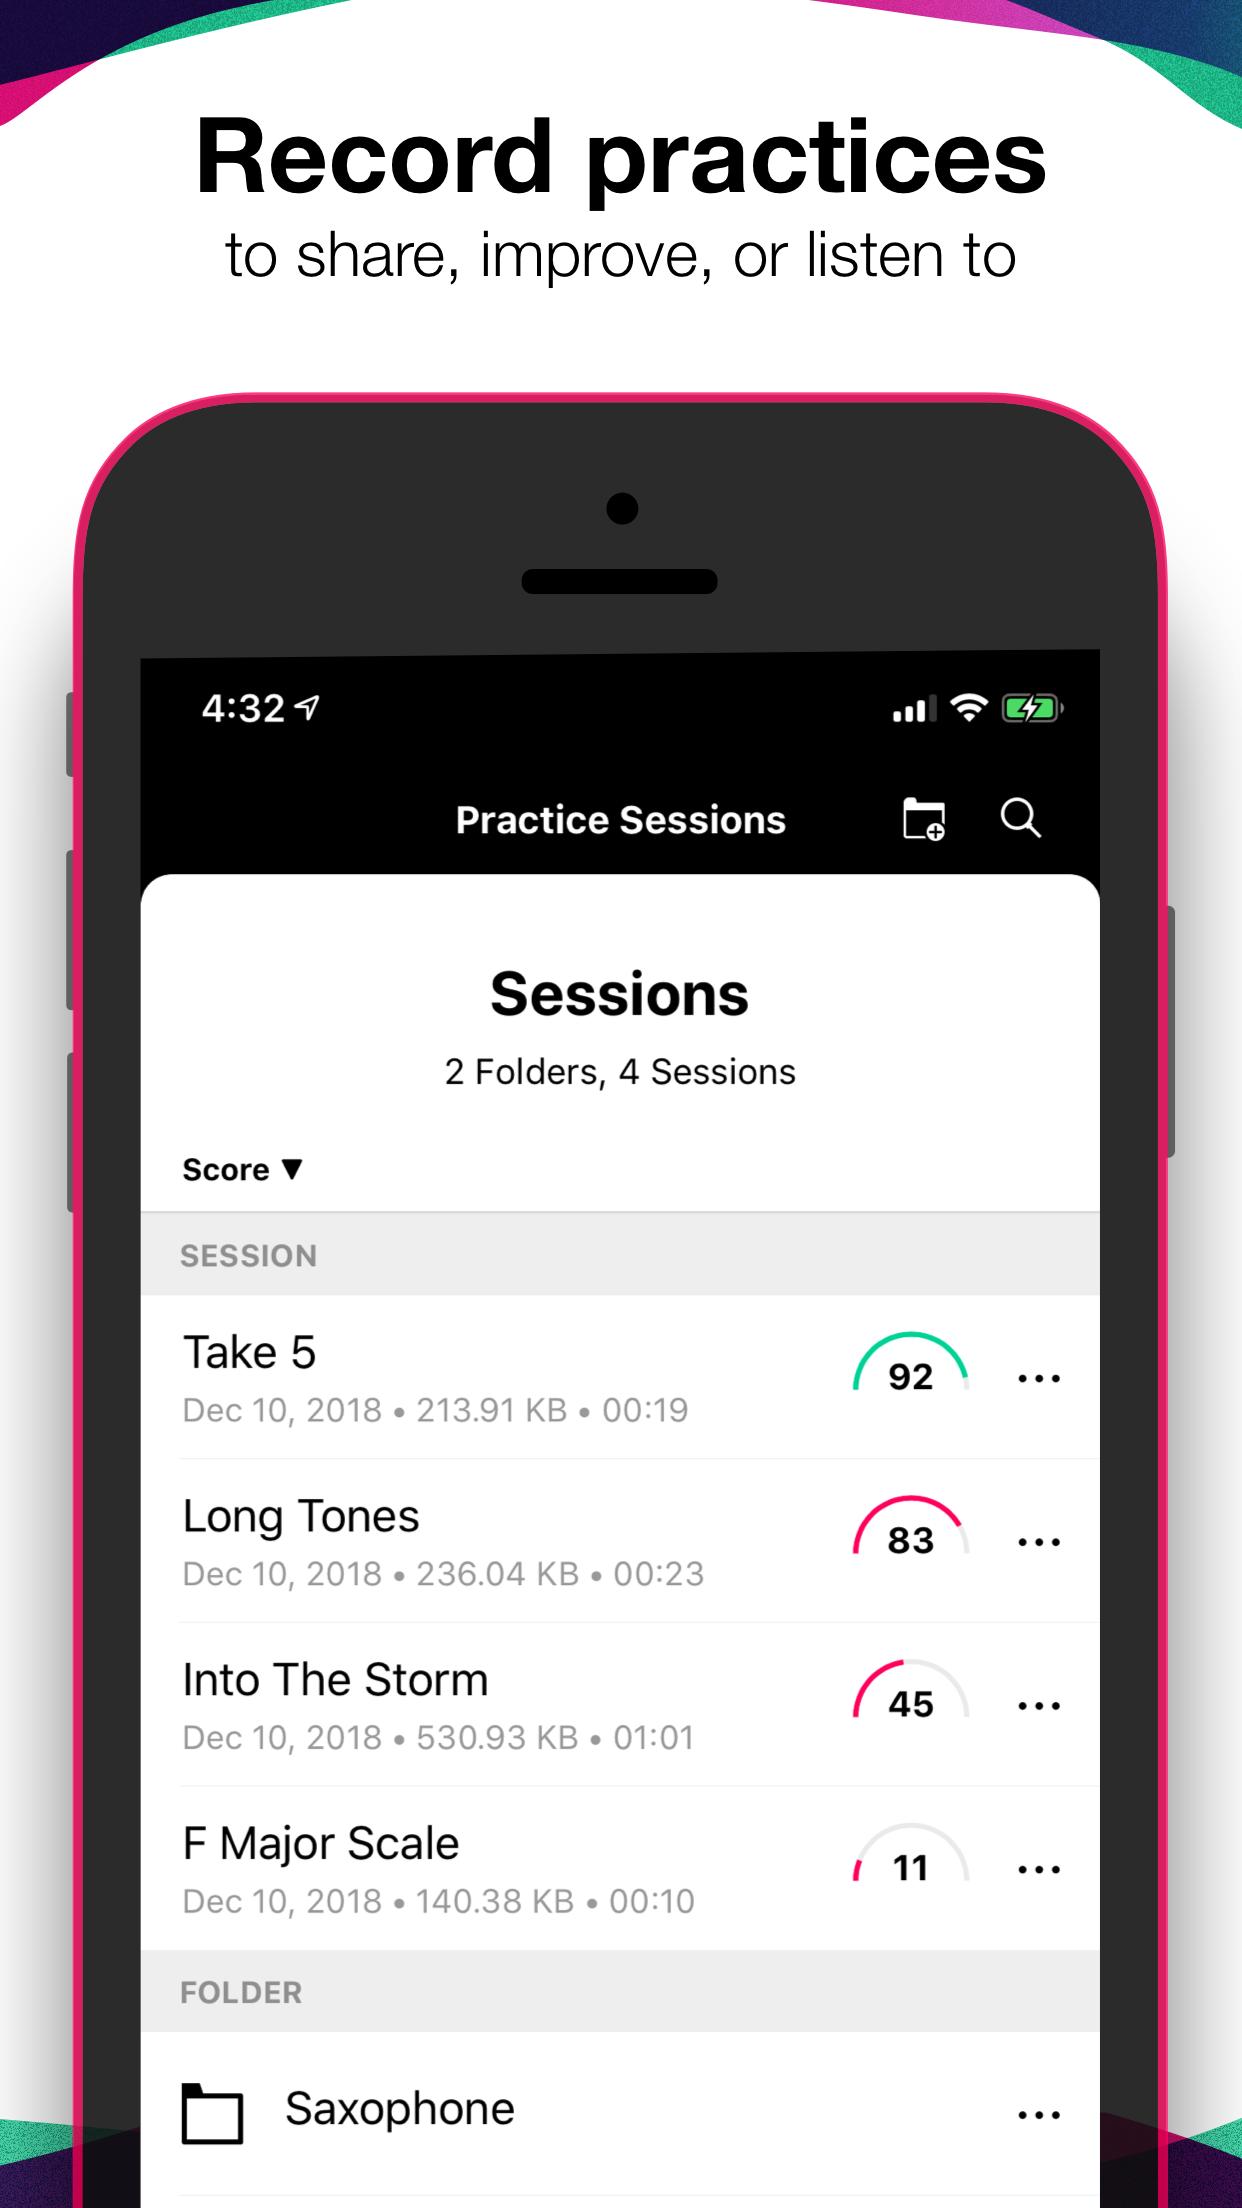 Tunable - Music Practice Tools Screenshot